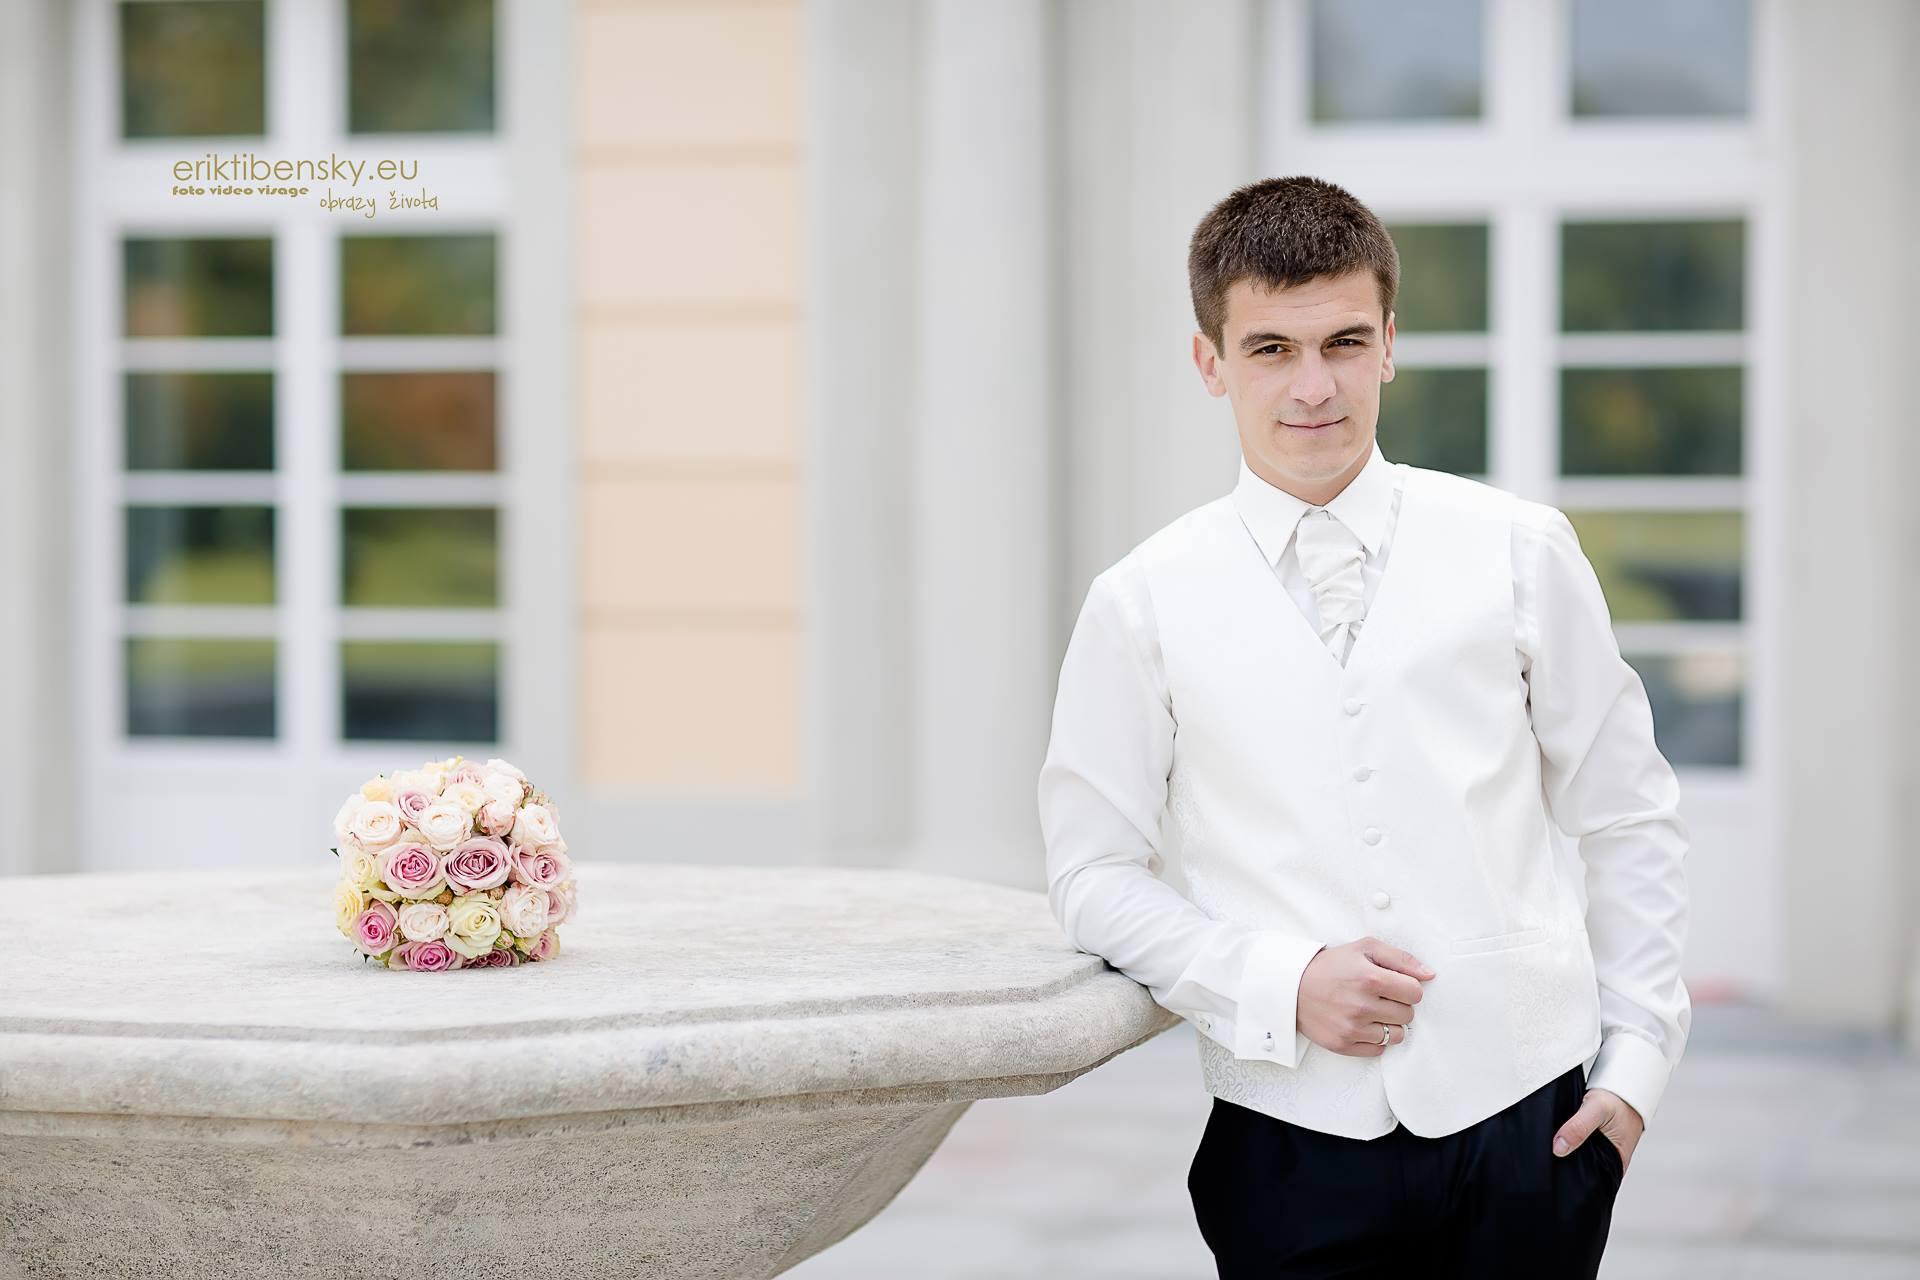 eriktibensky-eu-svadobny-fotograf-wedding-photographer-3075